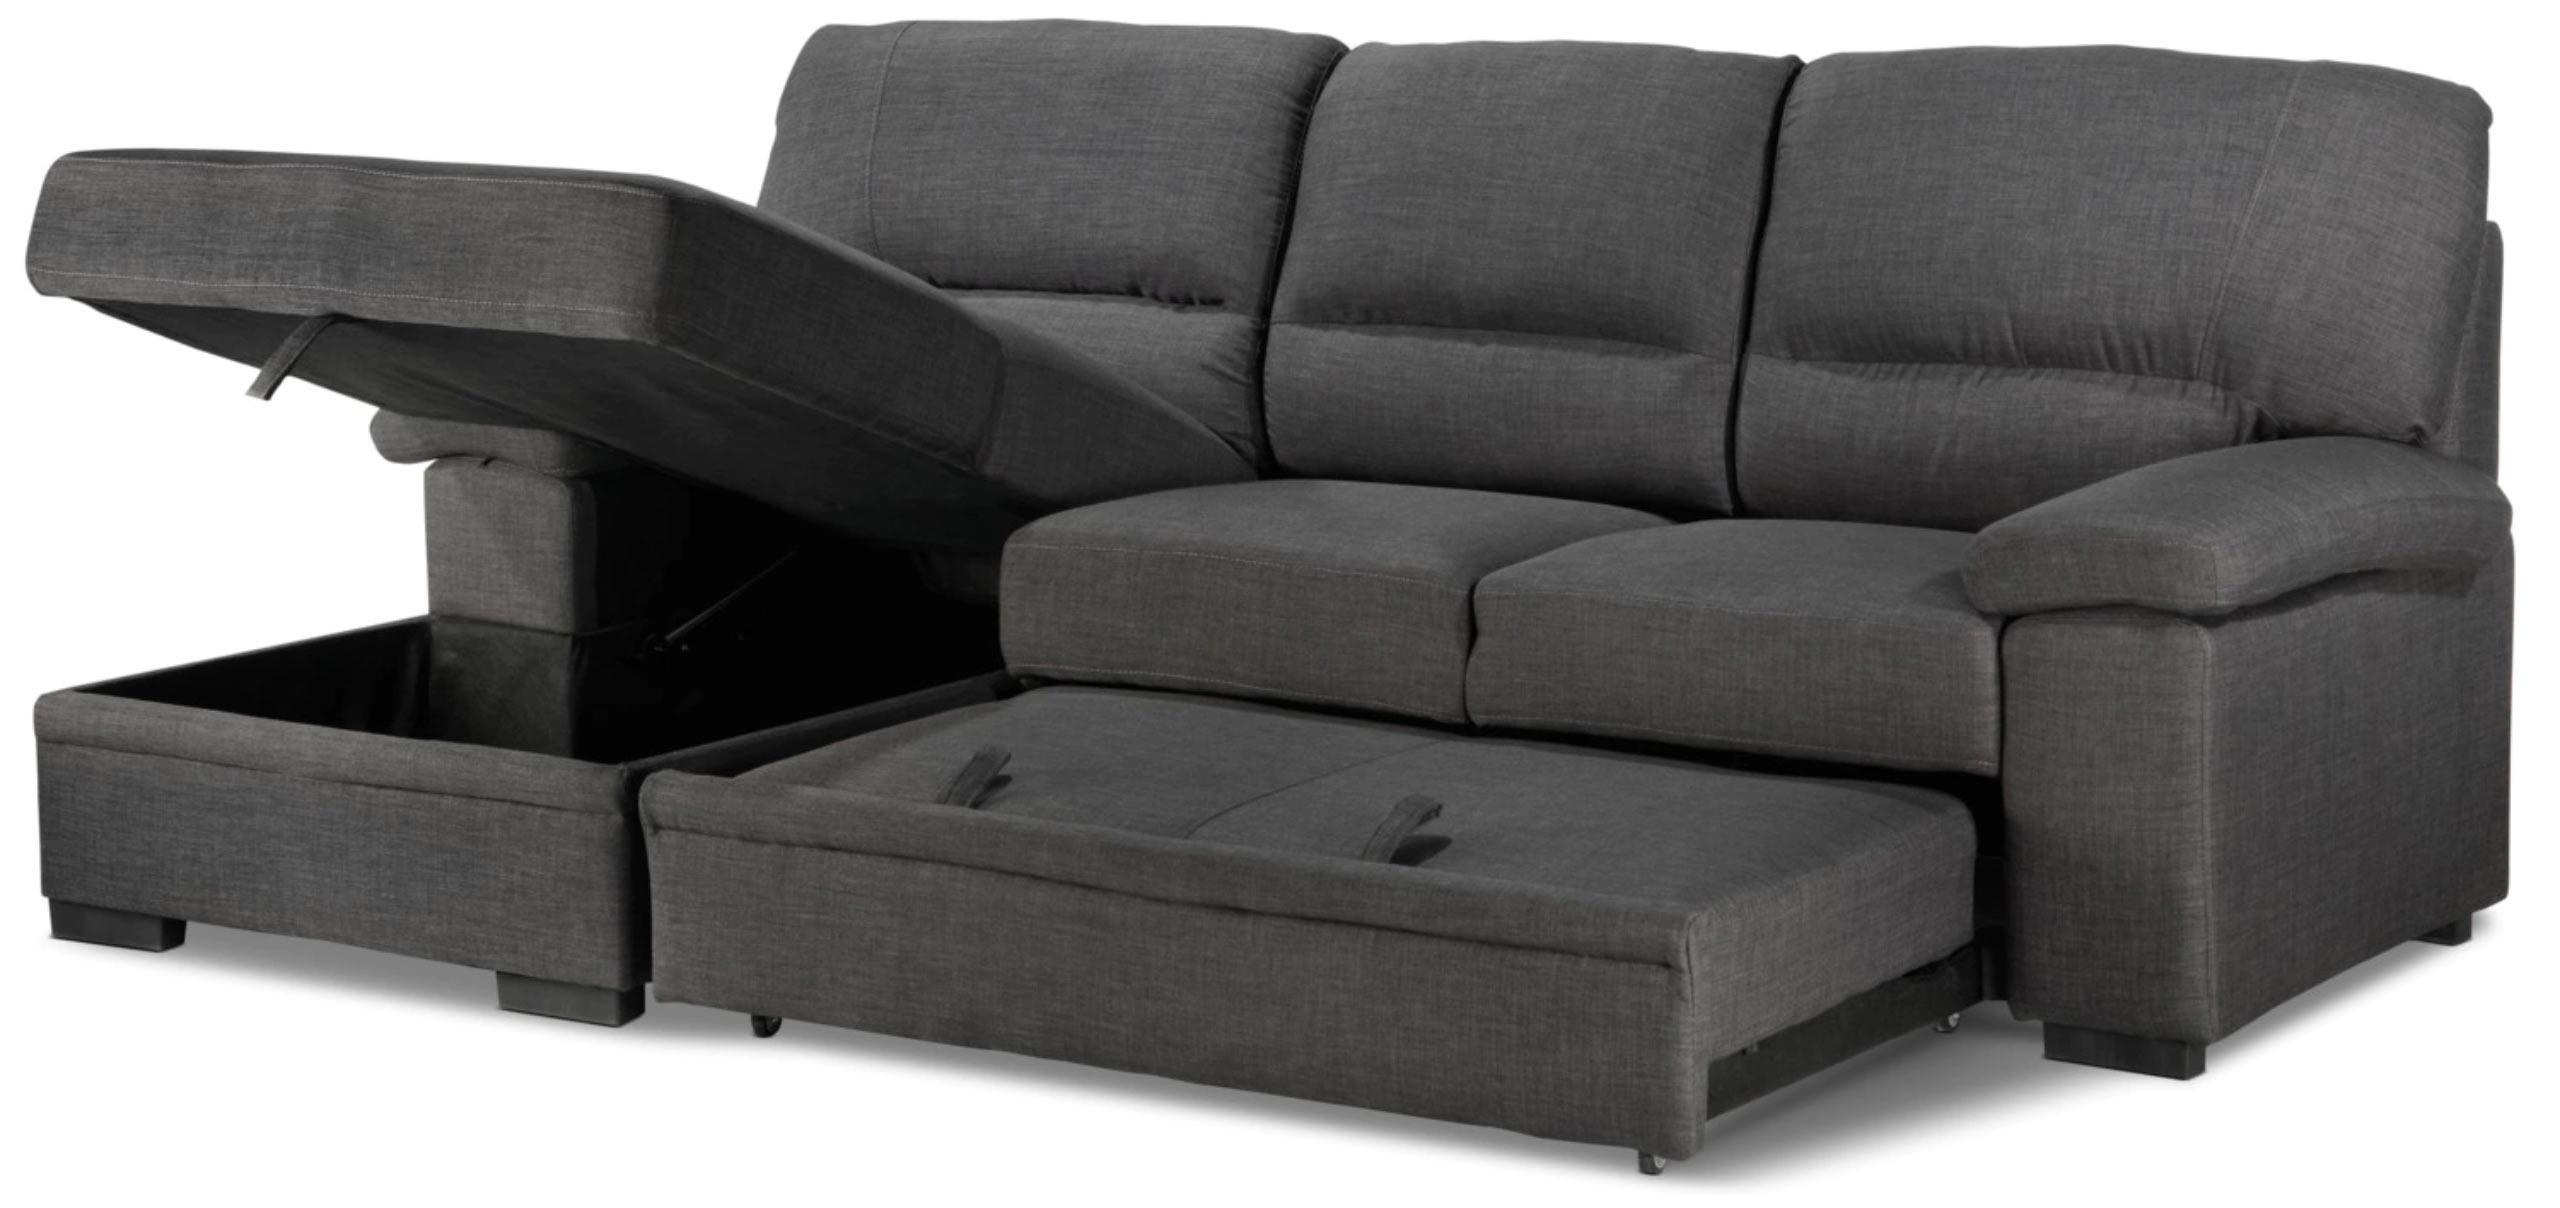 Tessaro Sleeper Sectional Dark Gray By Primo